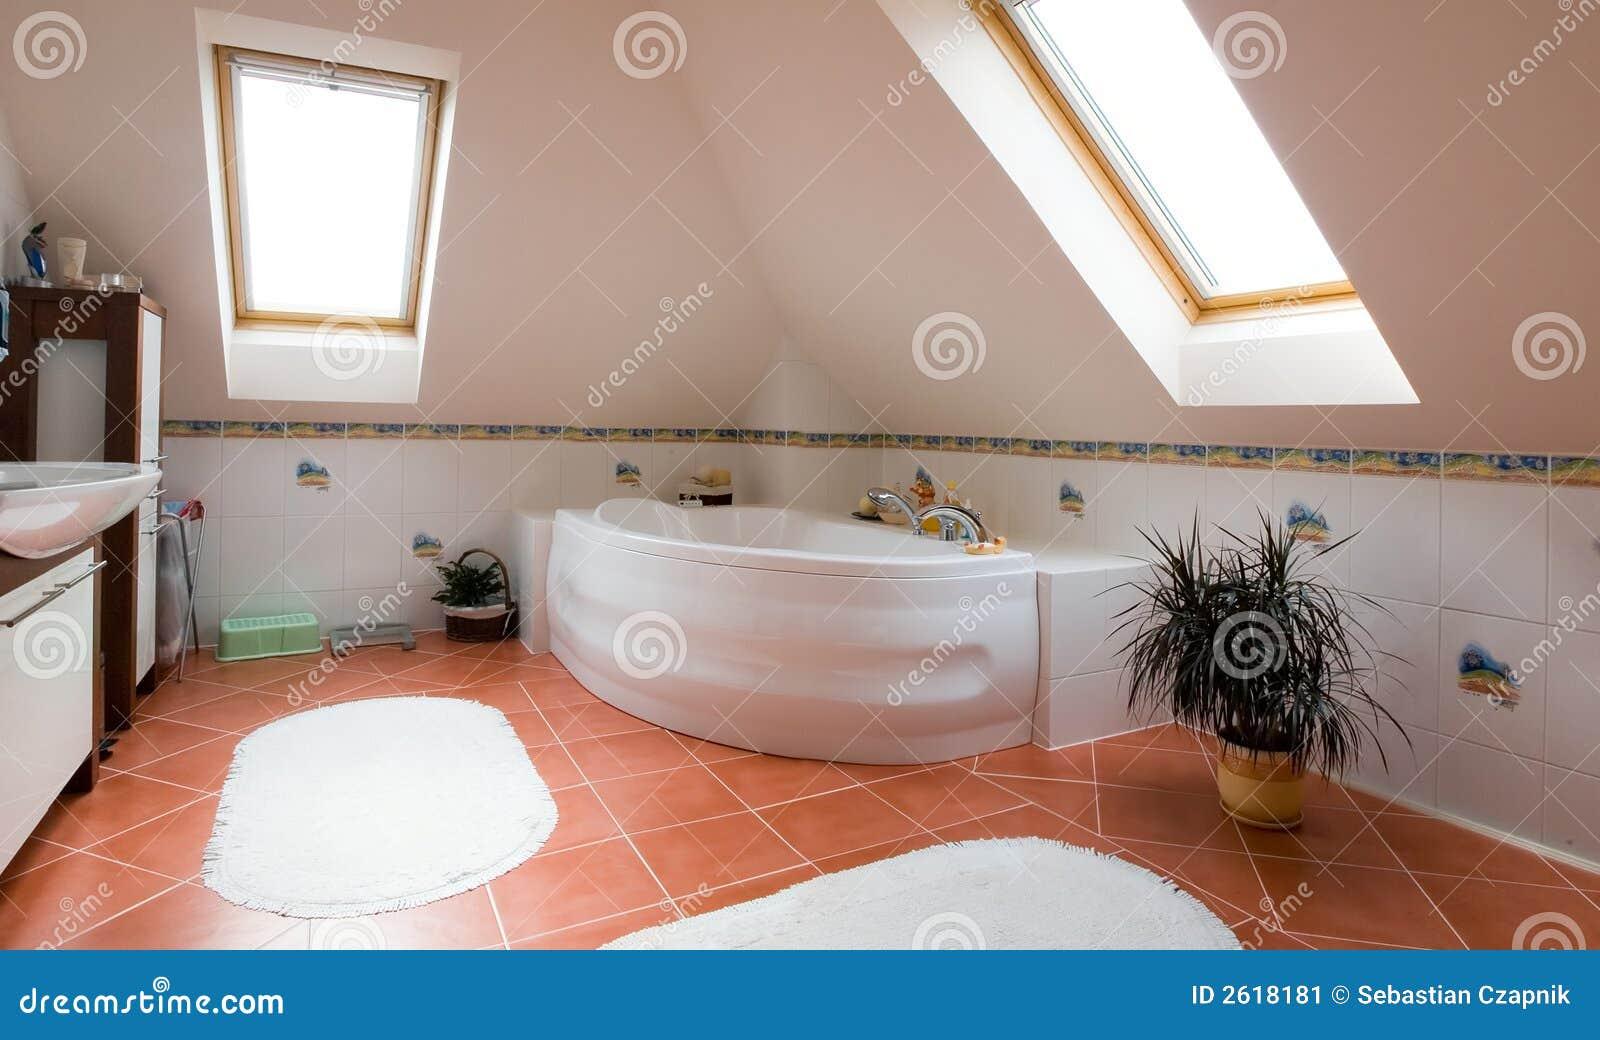 Panorama moderno del cuarto de baño